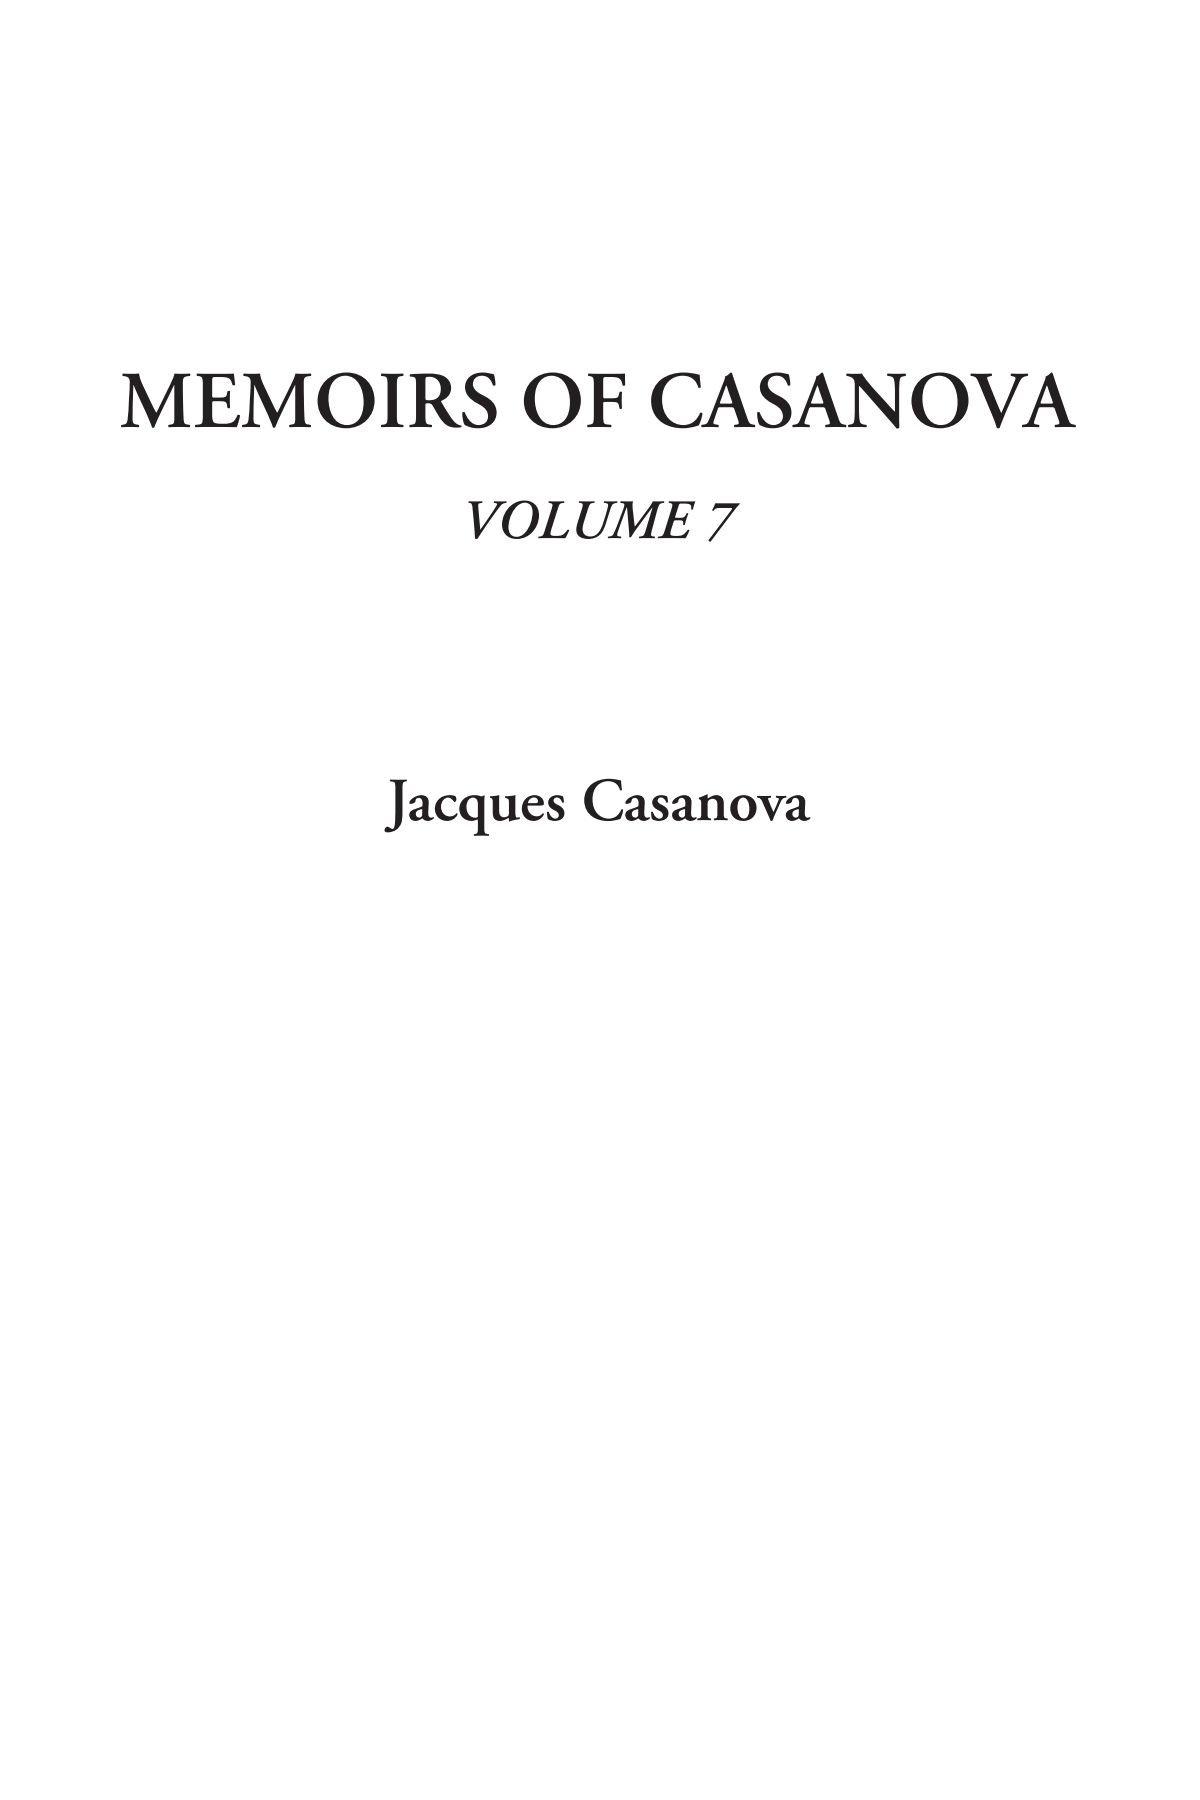 Read Online Memoirs of Casanova, Volume 7 PDF